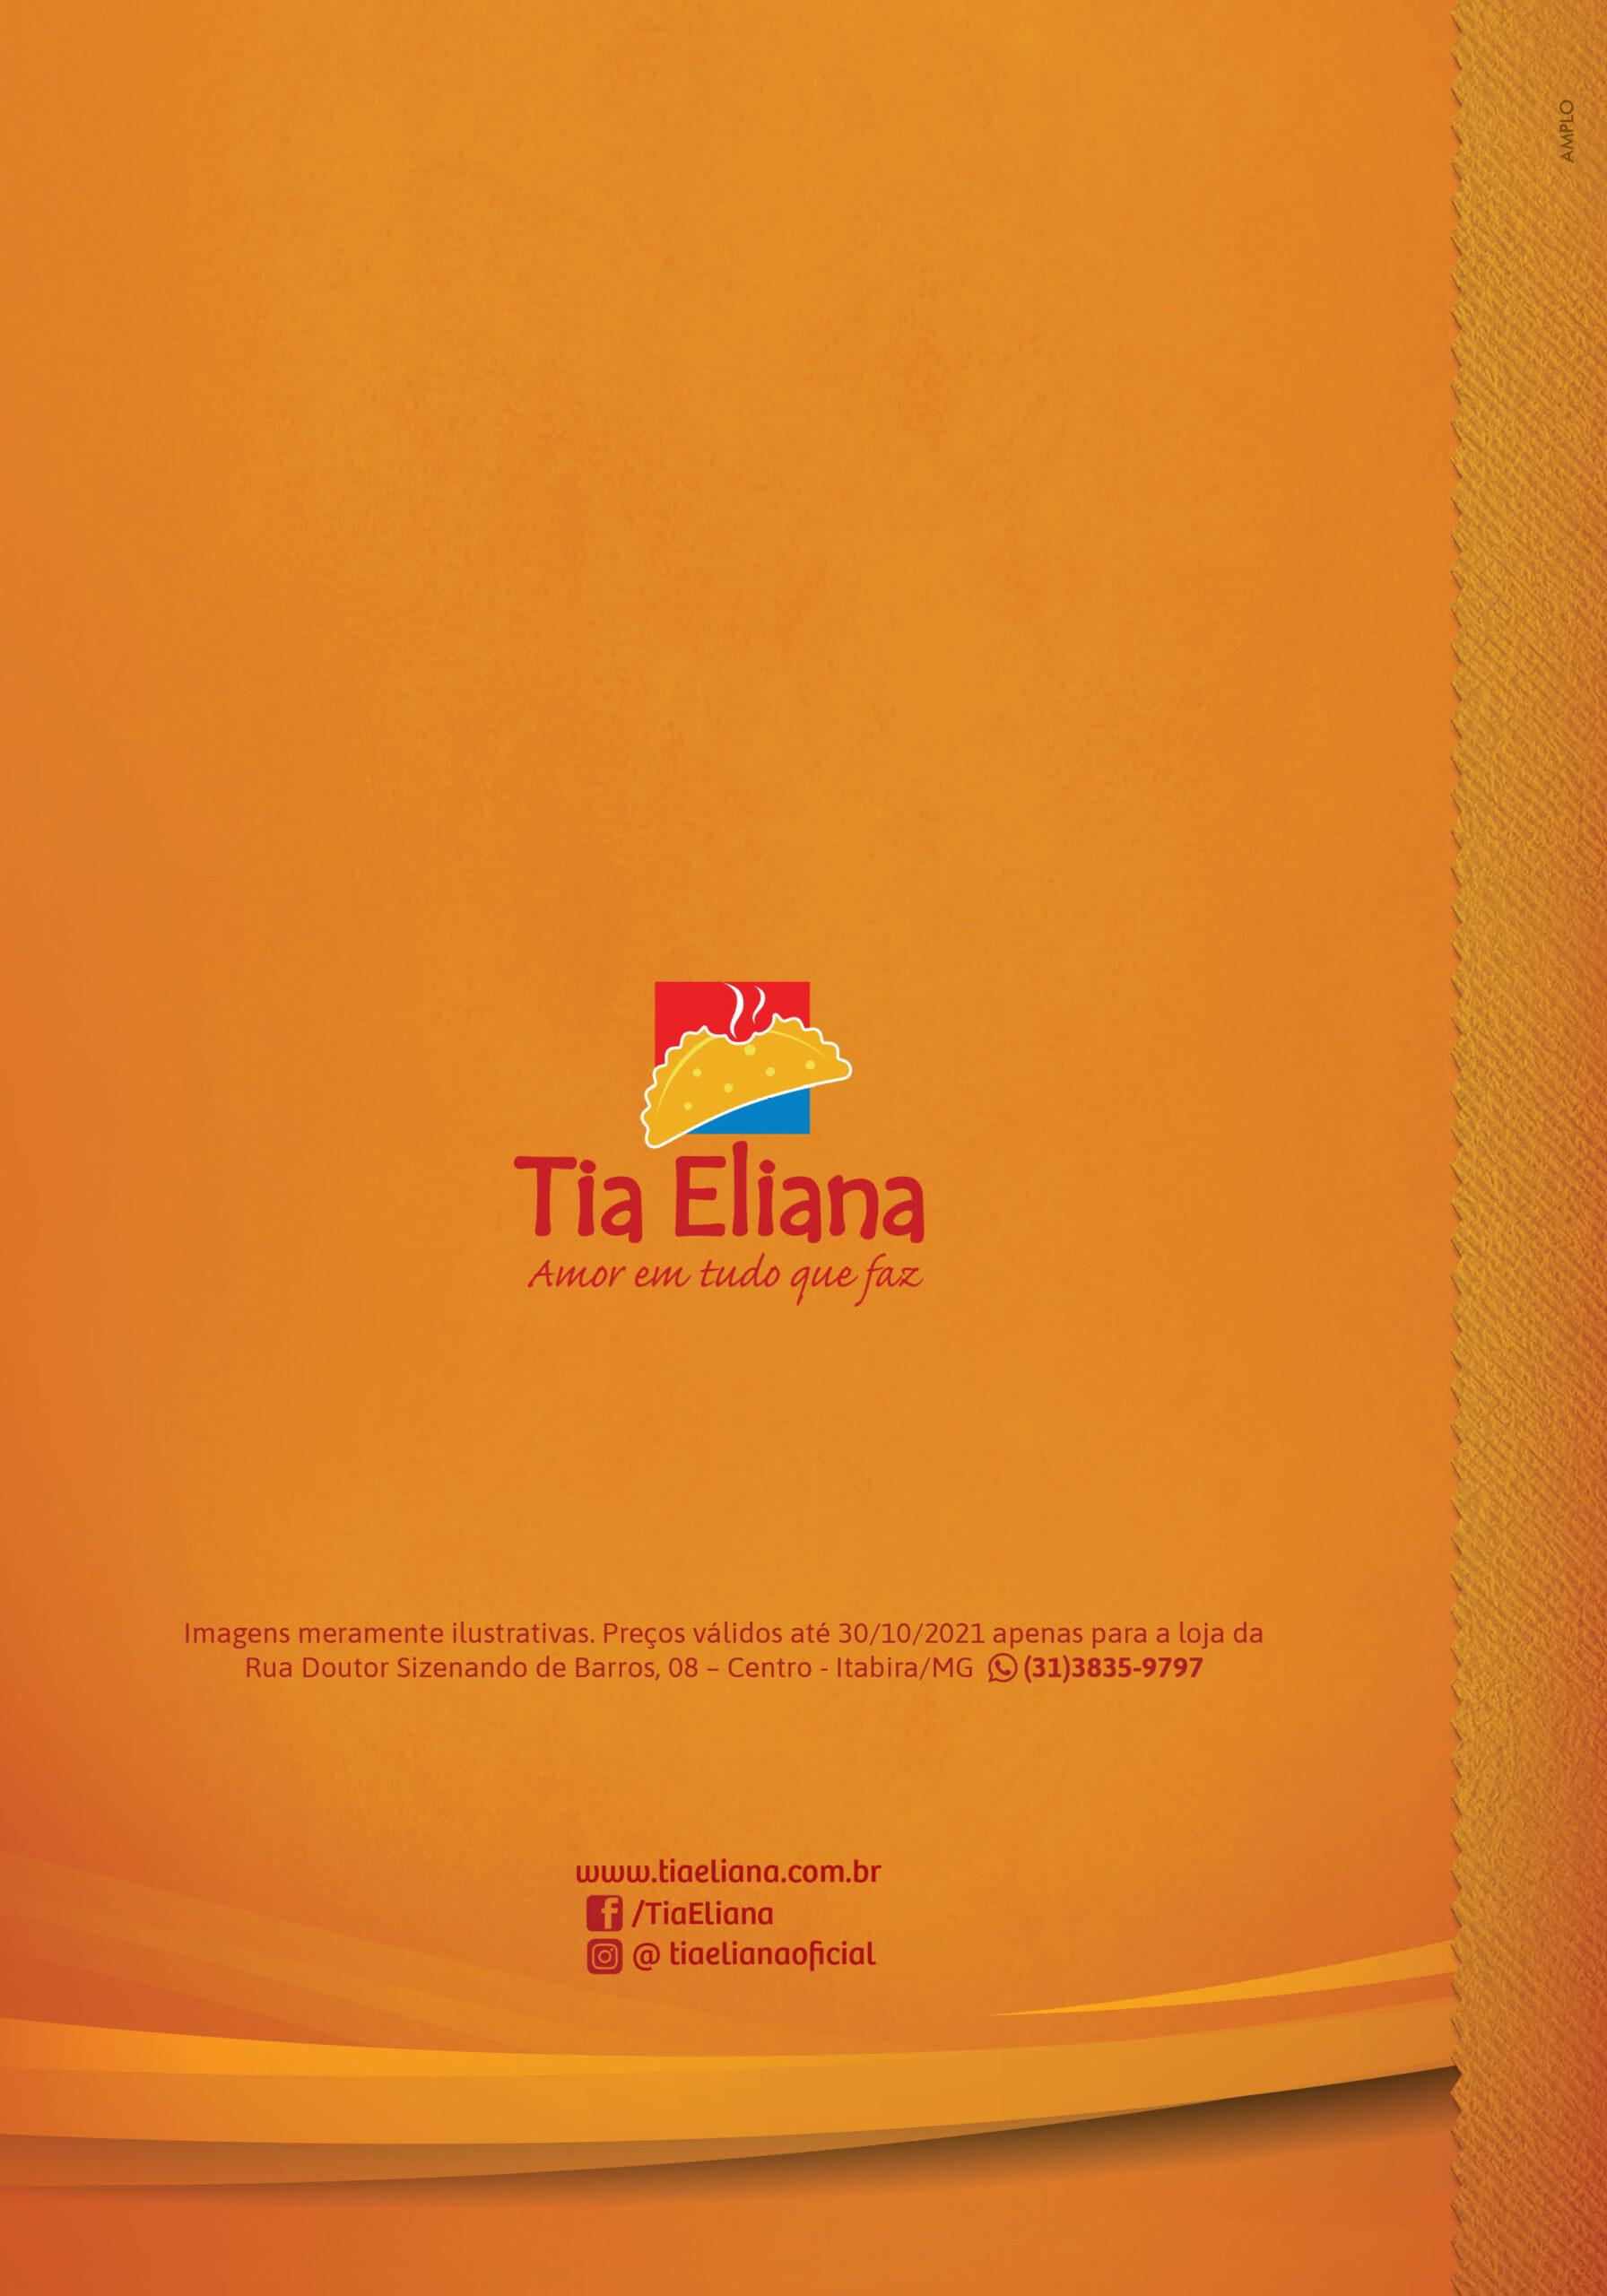 cardapio_completo_interior_a4_2021_tia_eliana_itabira_sb_V212-scaled Itabira - Sizenando Barros